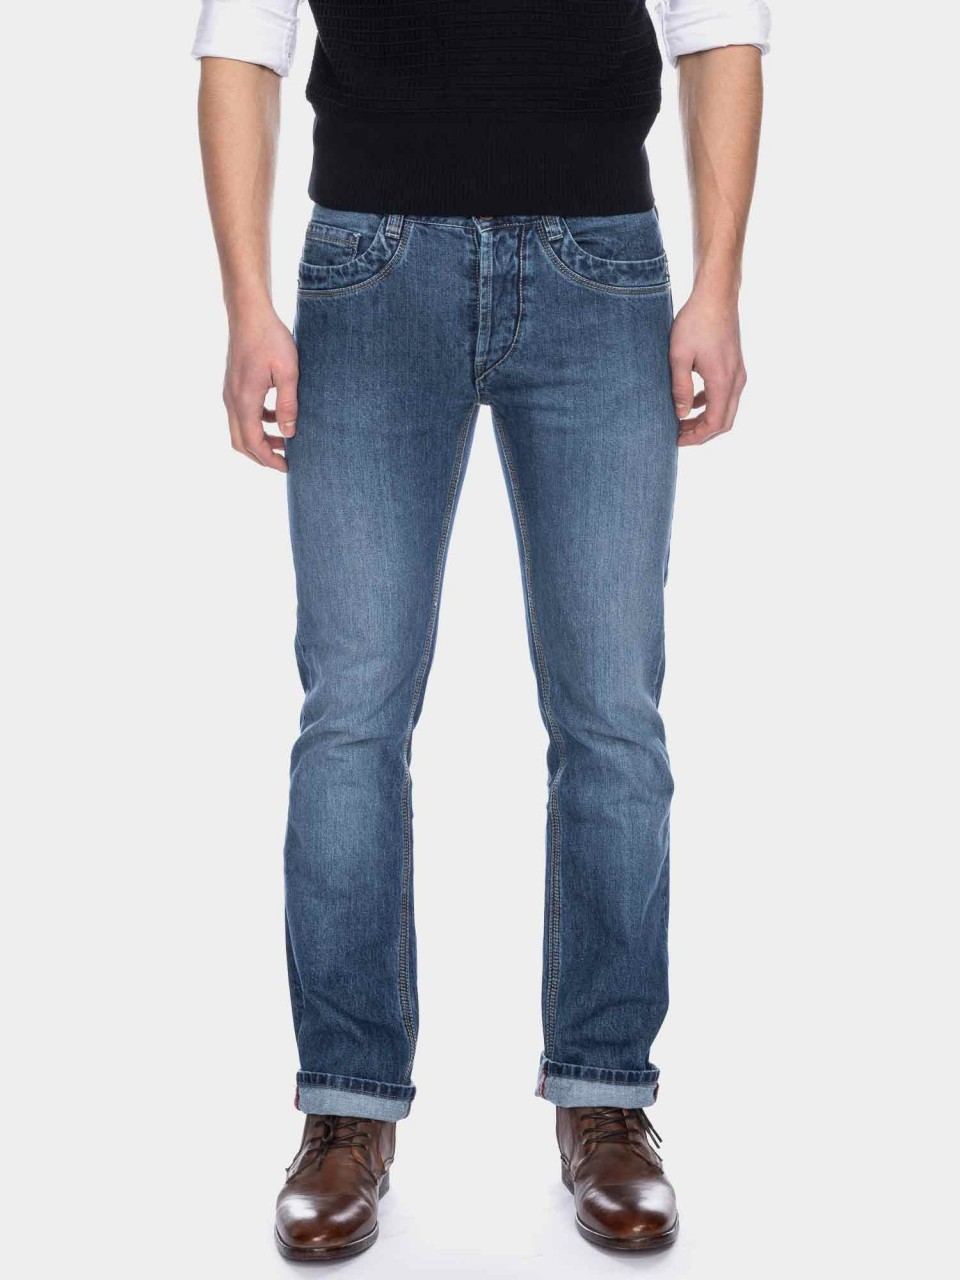 Jeans Egon Baga GOTS BL USD